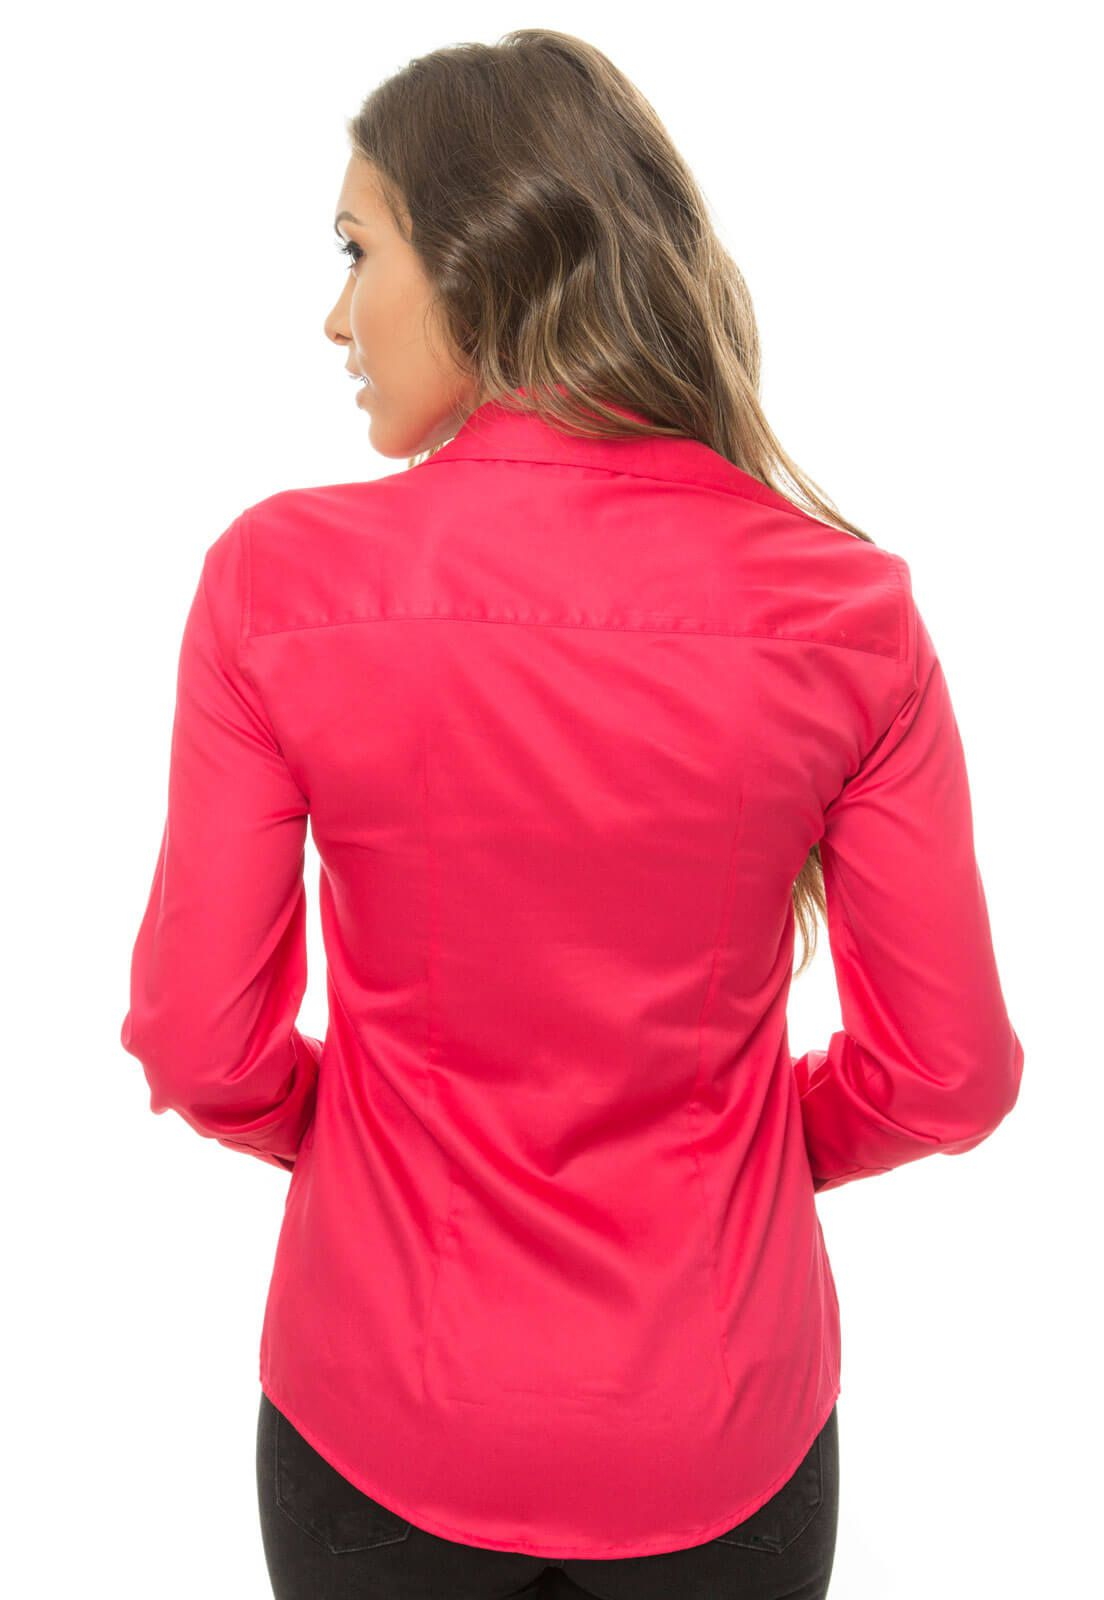 Camisa Camisete Feminino Olimpo 100% Algodão Fio 80 Manga Longa Rosa